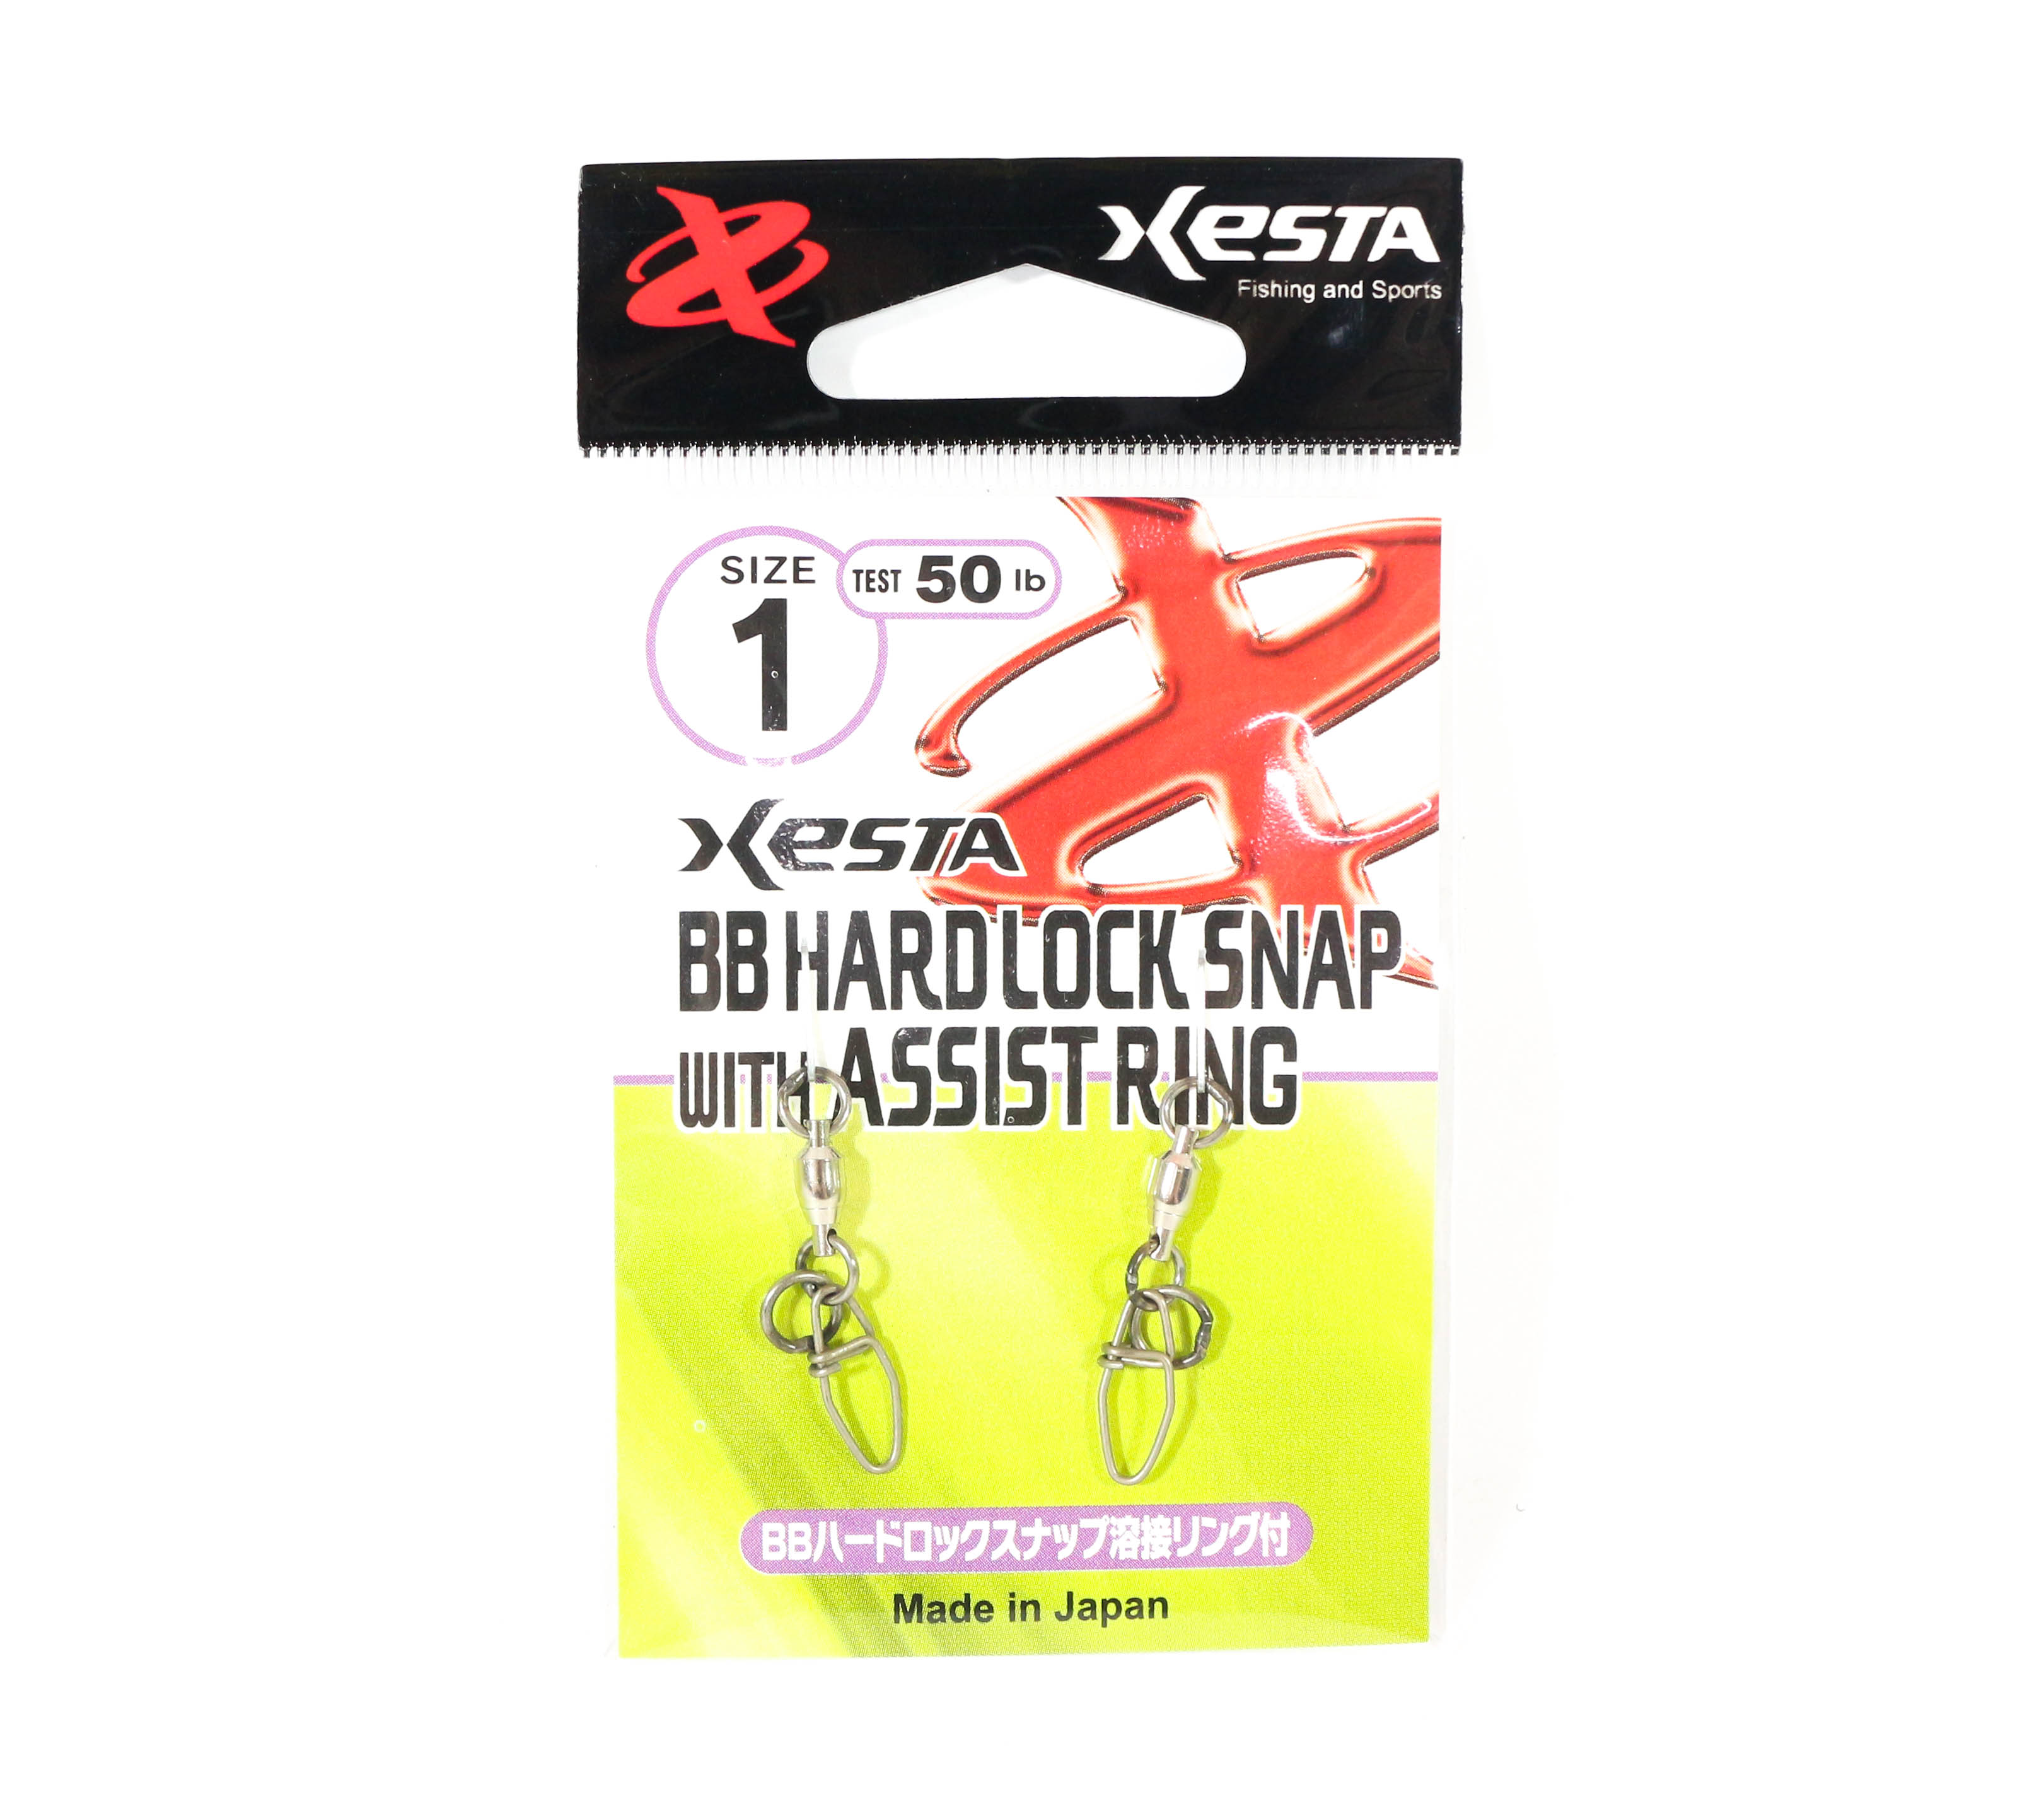 Xesta BB Hard Lock Snap Plus Ring Size 1 50 lb , 2 pieces (1805)